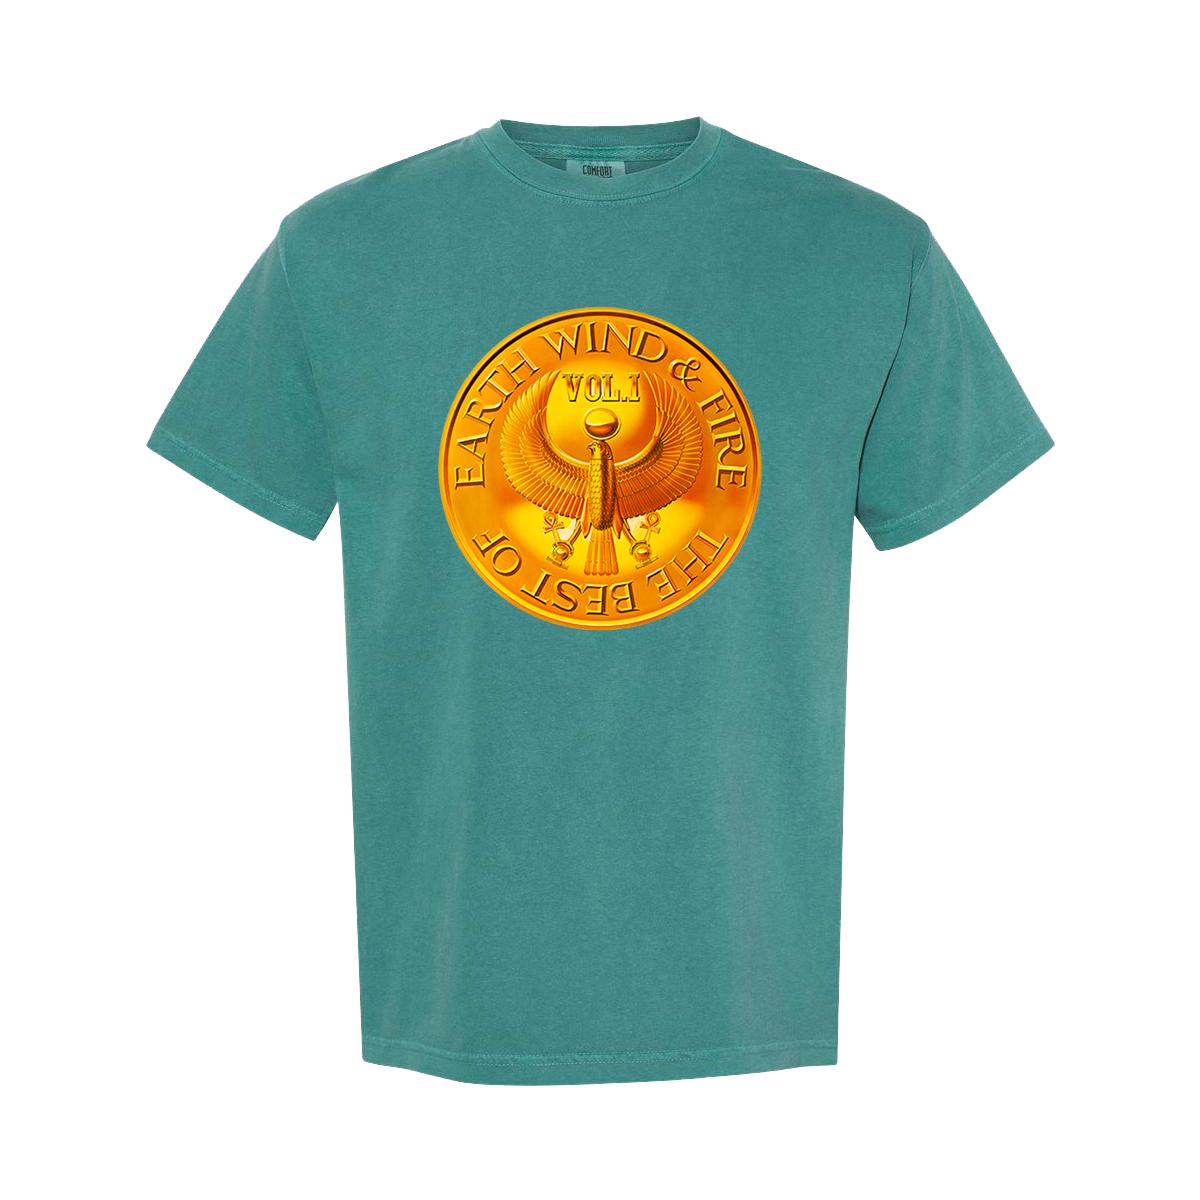 Earth, Wind & Fire Medallion Teal T-Shirt